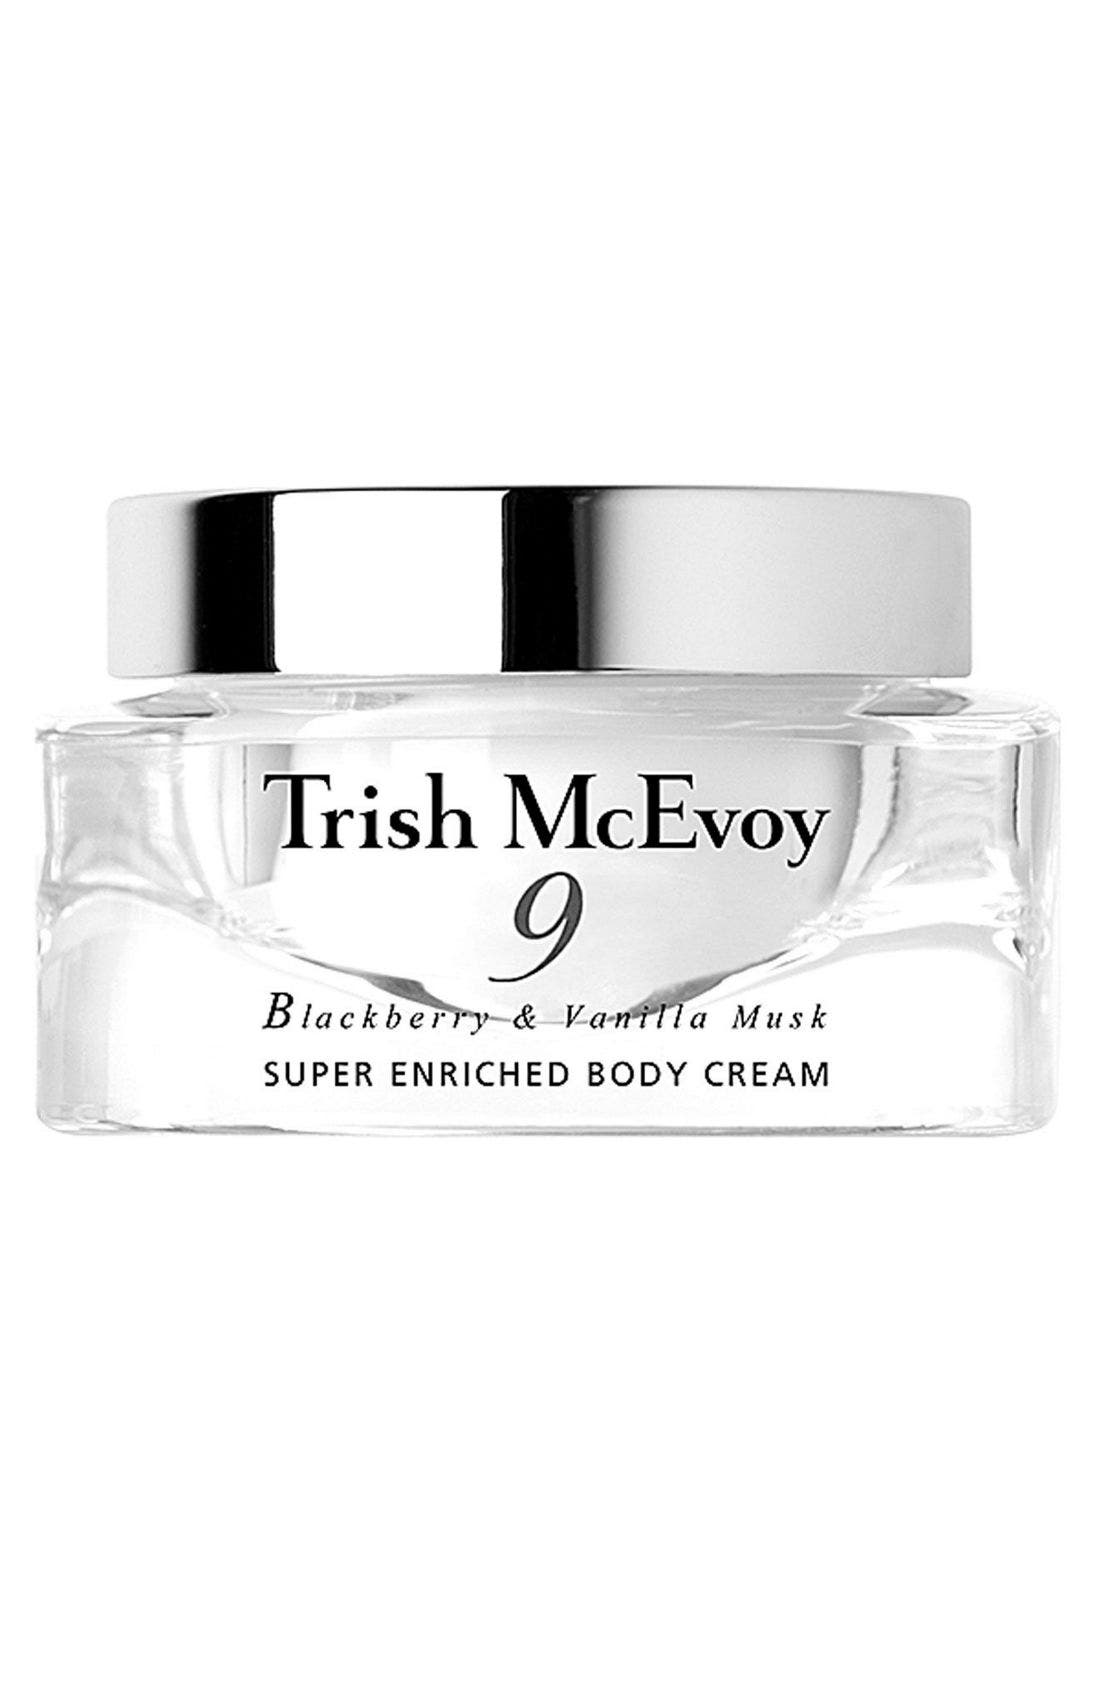 Trish McEvoy 'No. 9 Blackberry & Vanilla Musk' Super Enriched Body Cream